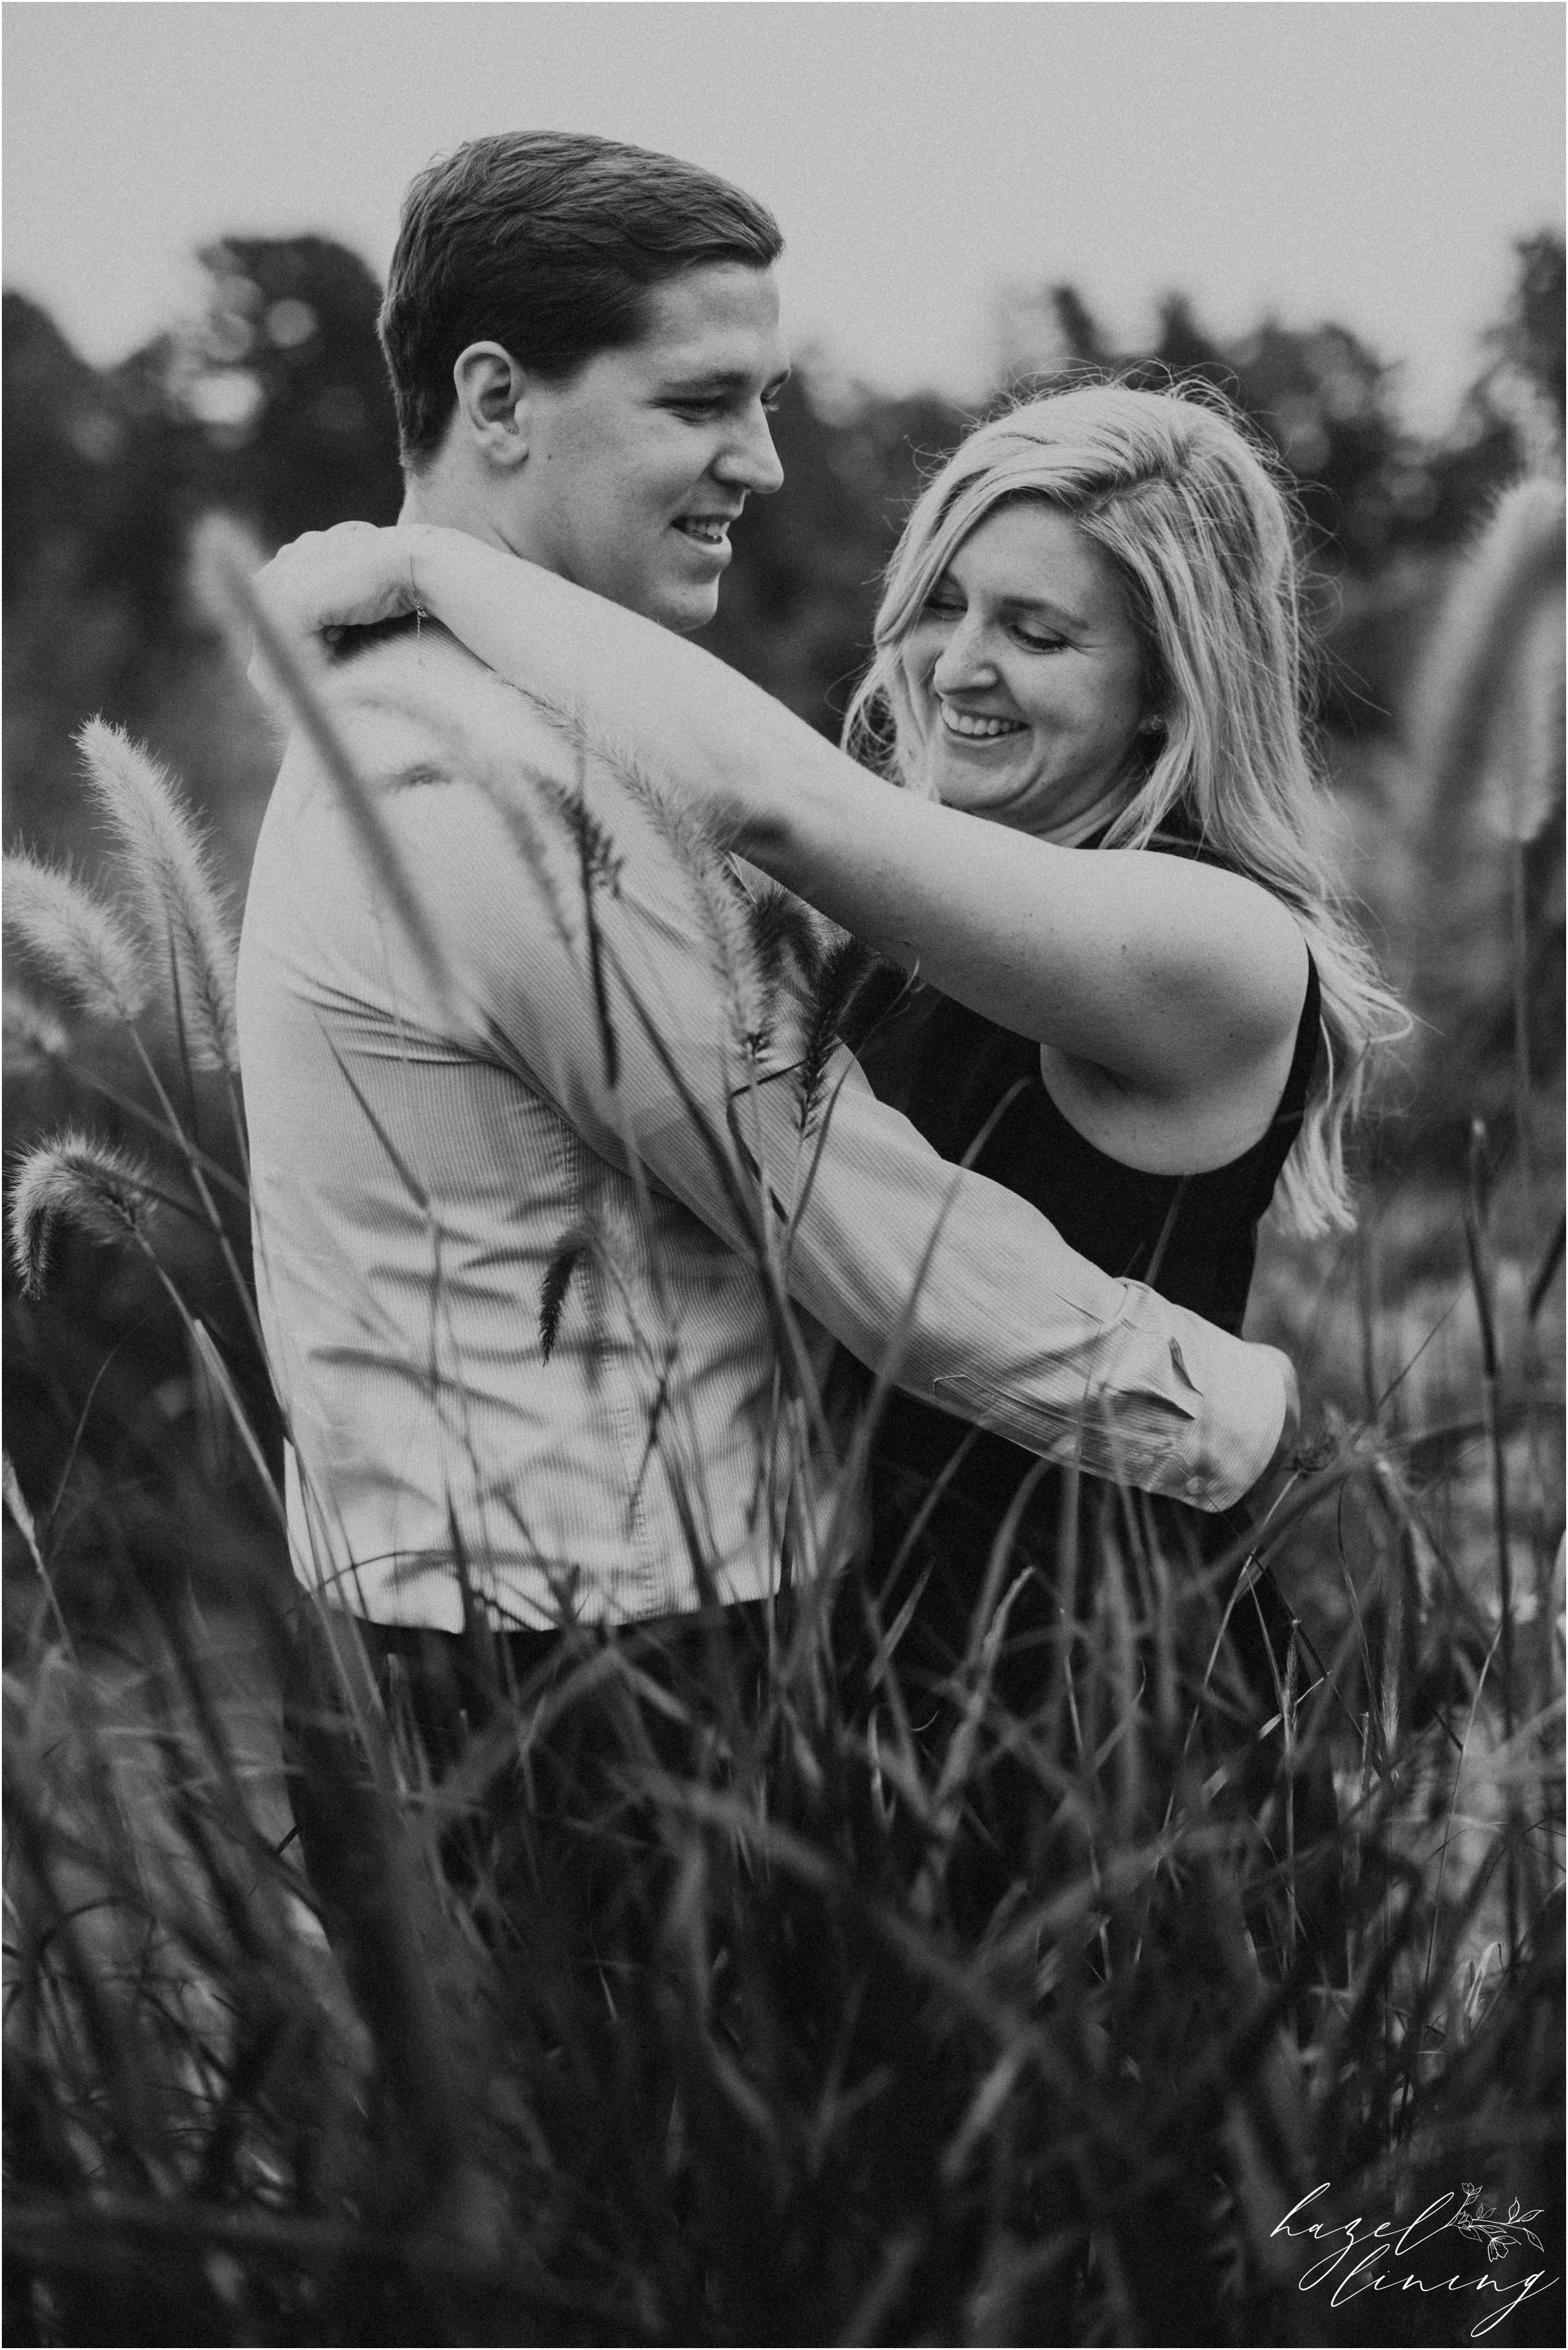 victoria-travis-logan-mayes-longwood-gardens-kennett-square-philadelphia-engagement-session-hazel-lining-photography-destination-elopement-wedding-engagement-photography_0030.jpg